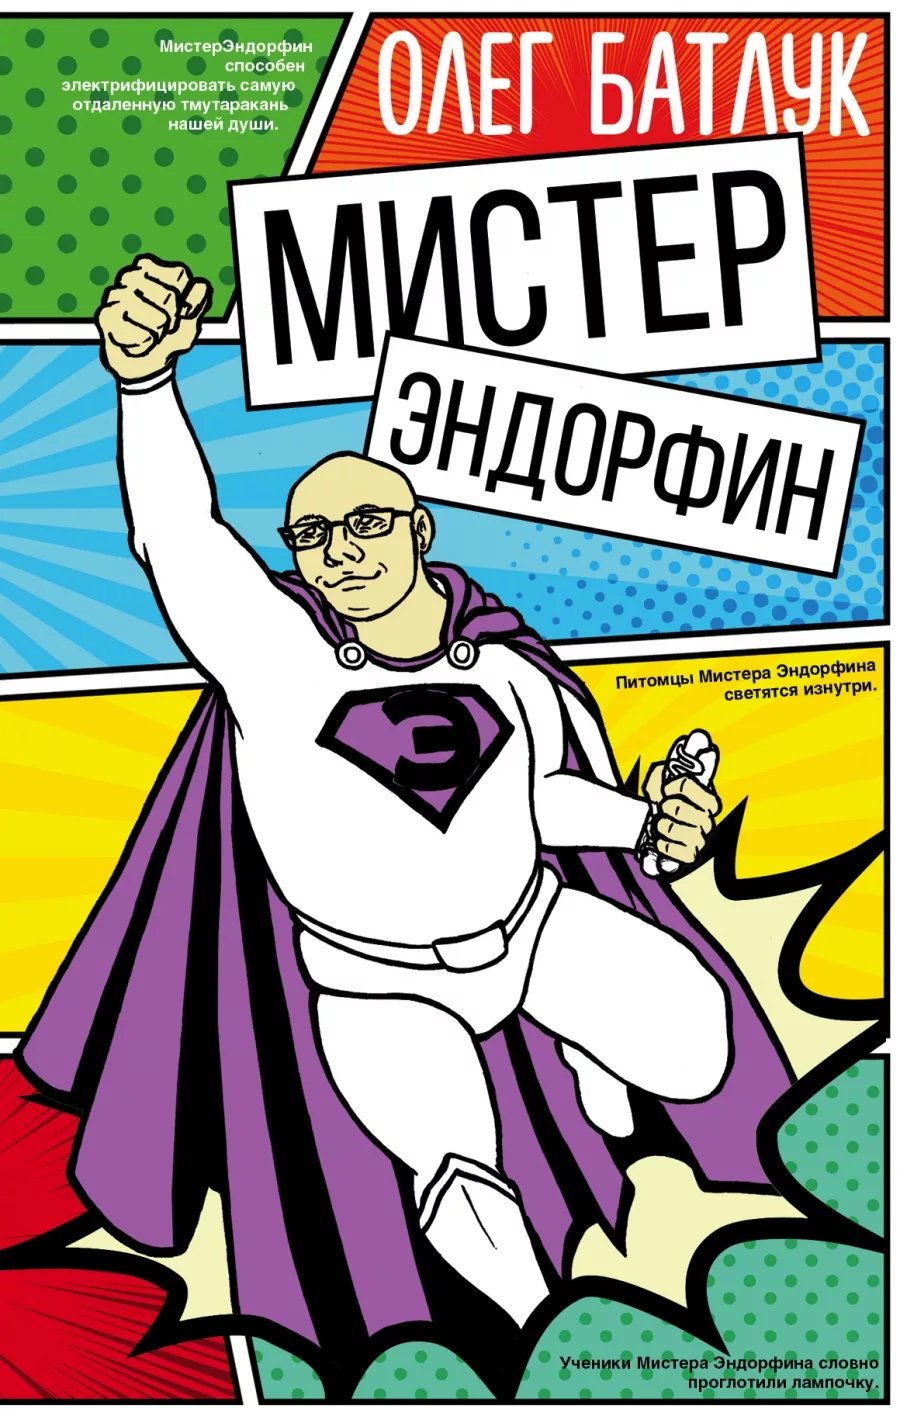 Книга Олега Батлука  про мистера Эндорфина